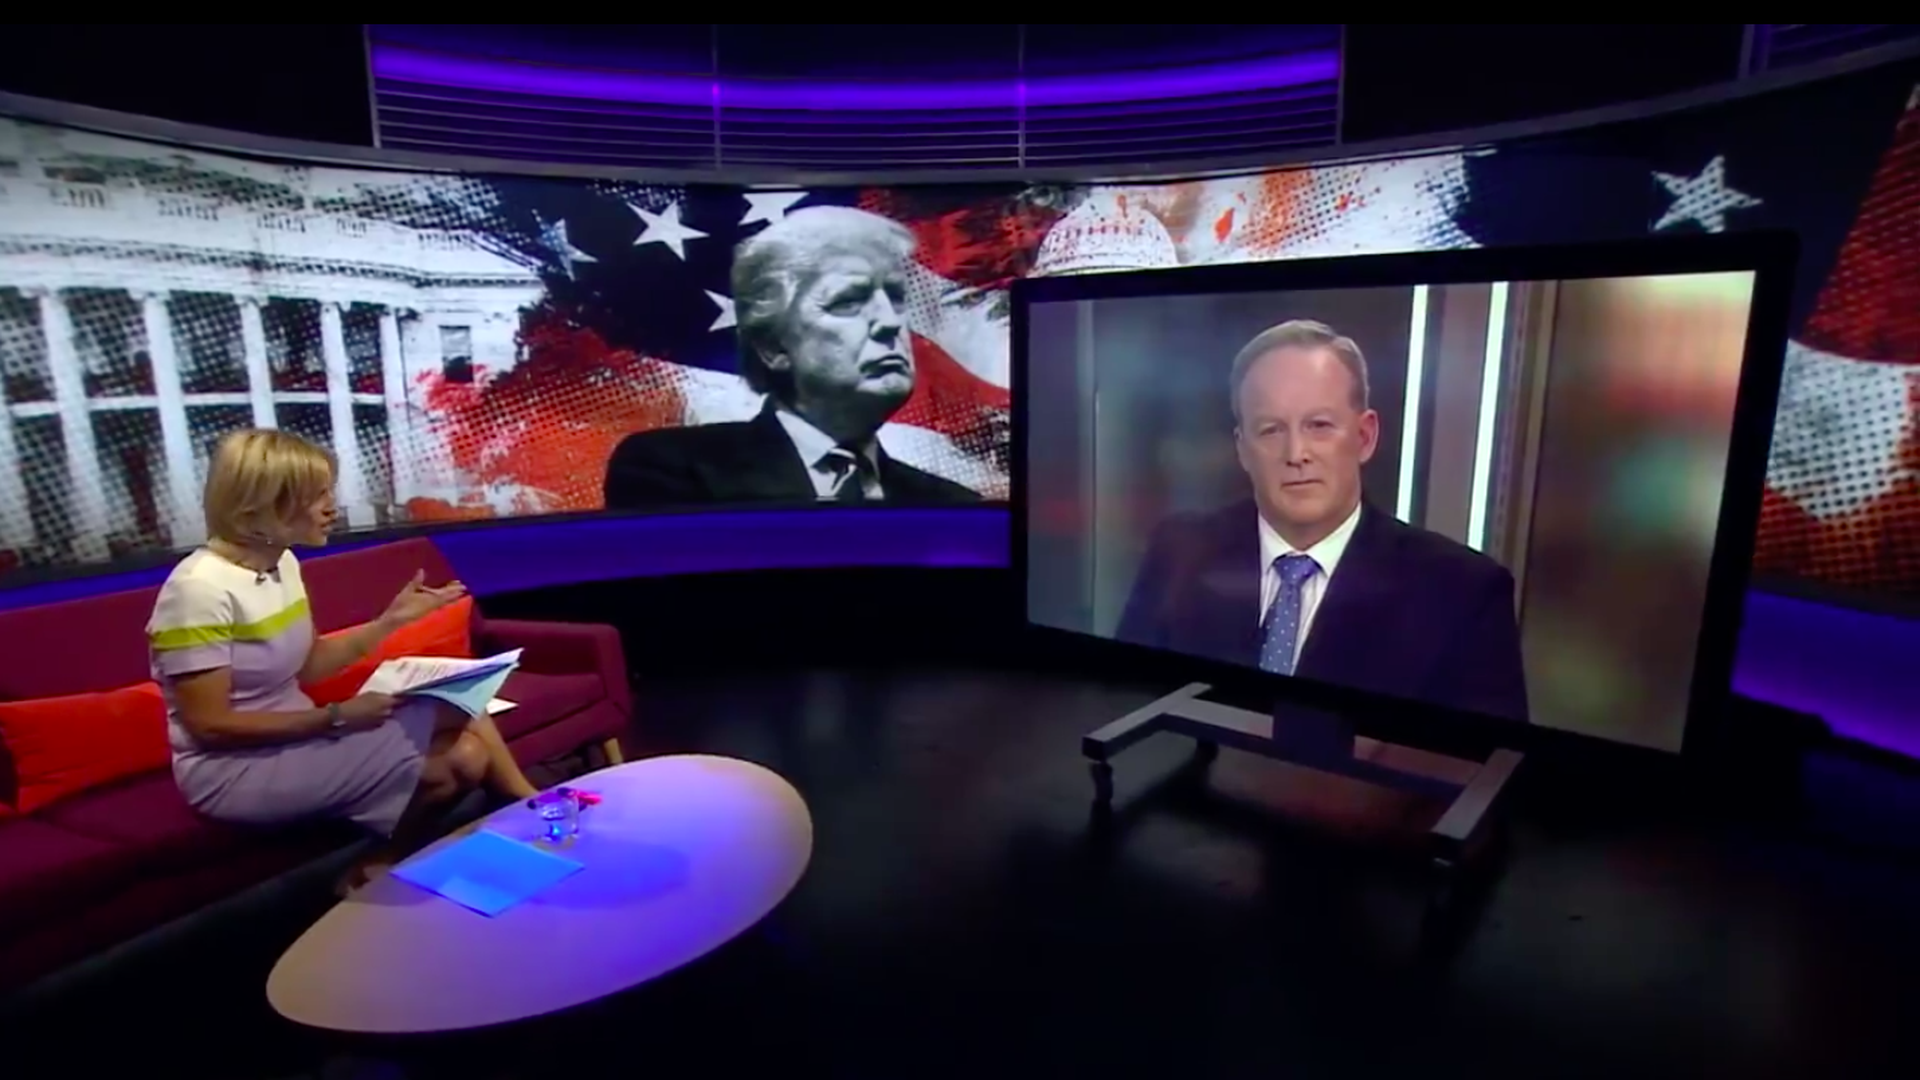 BBC's Emily Maitlis interviewing Sean Spicer via satellite.